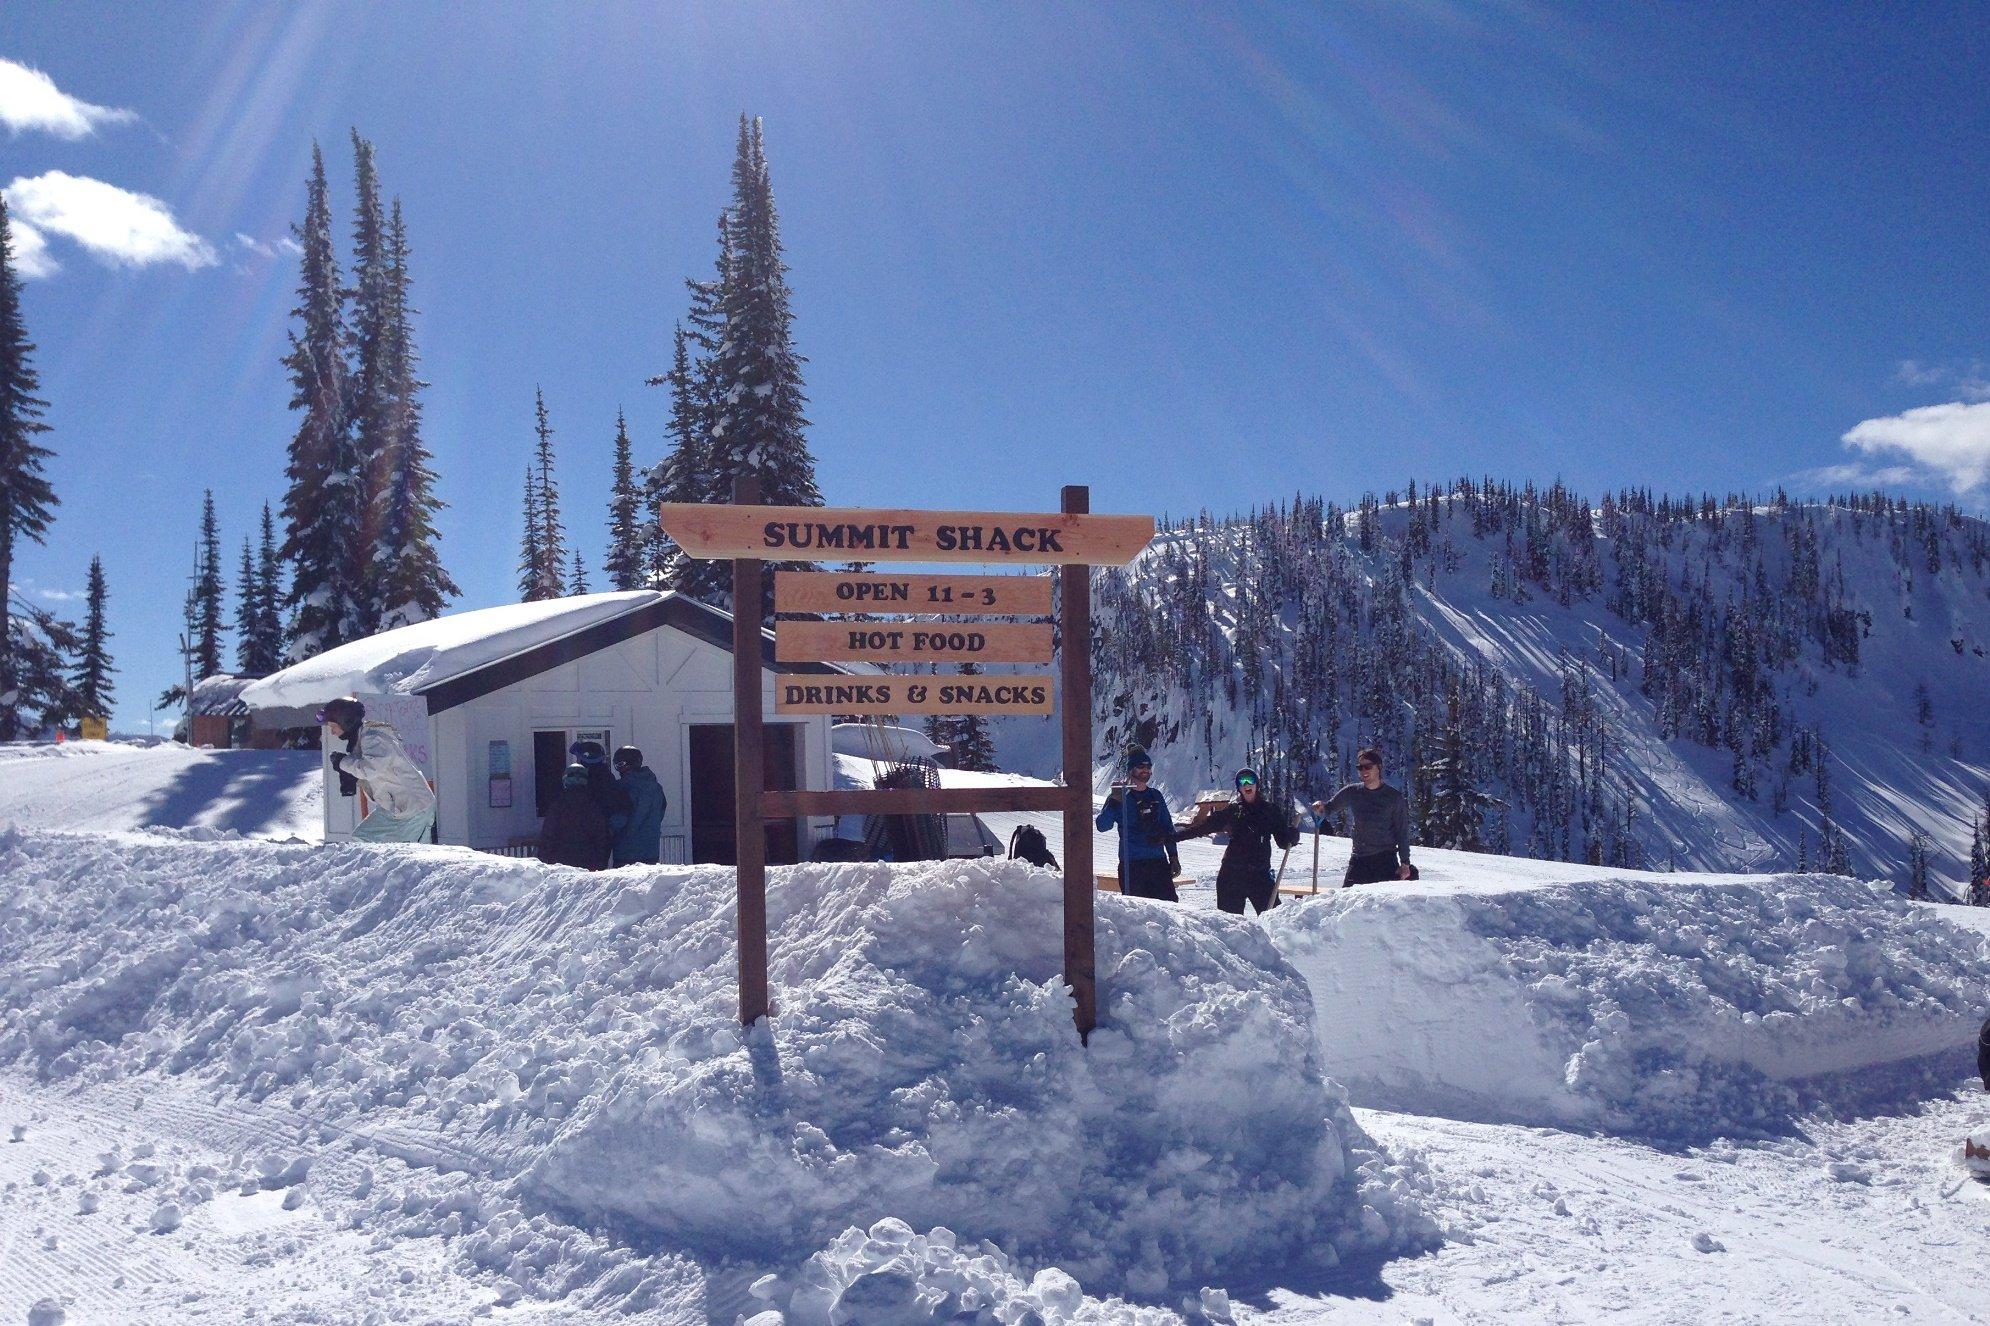 summit shack_img_8766 grip.jpg